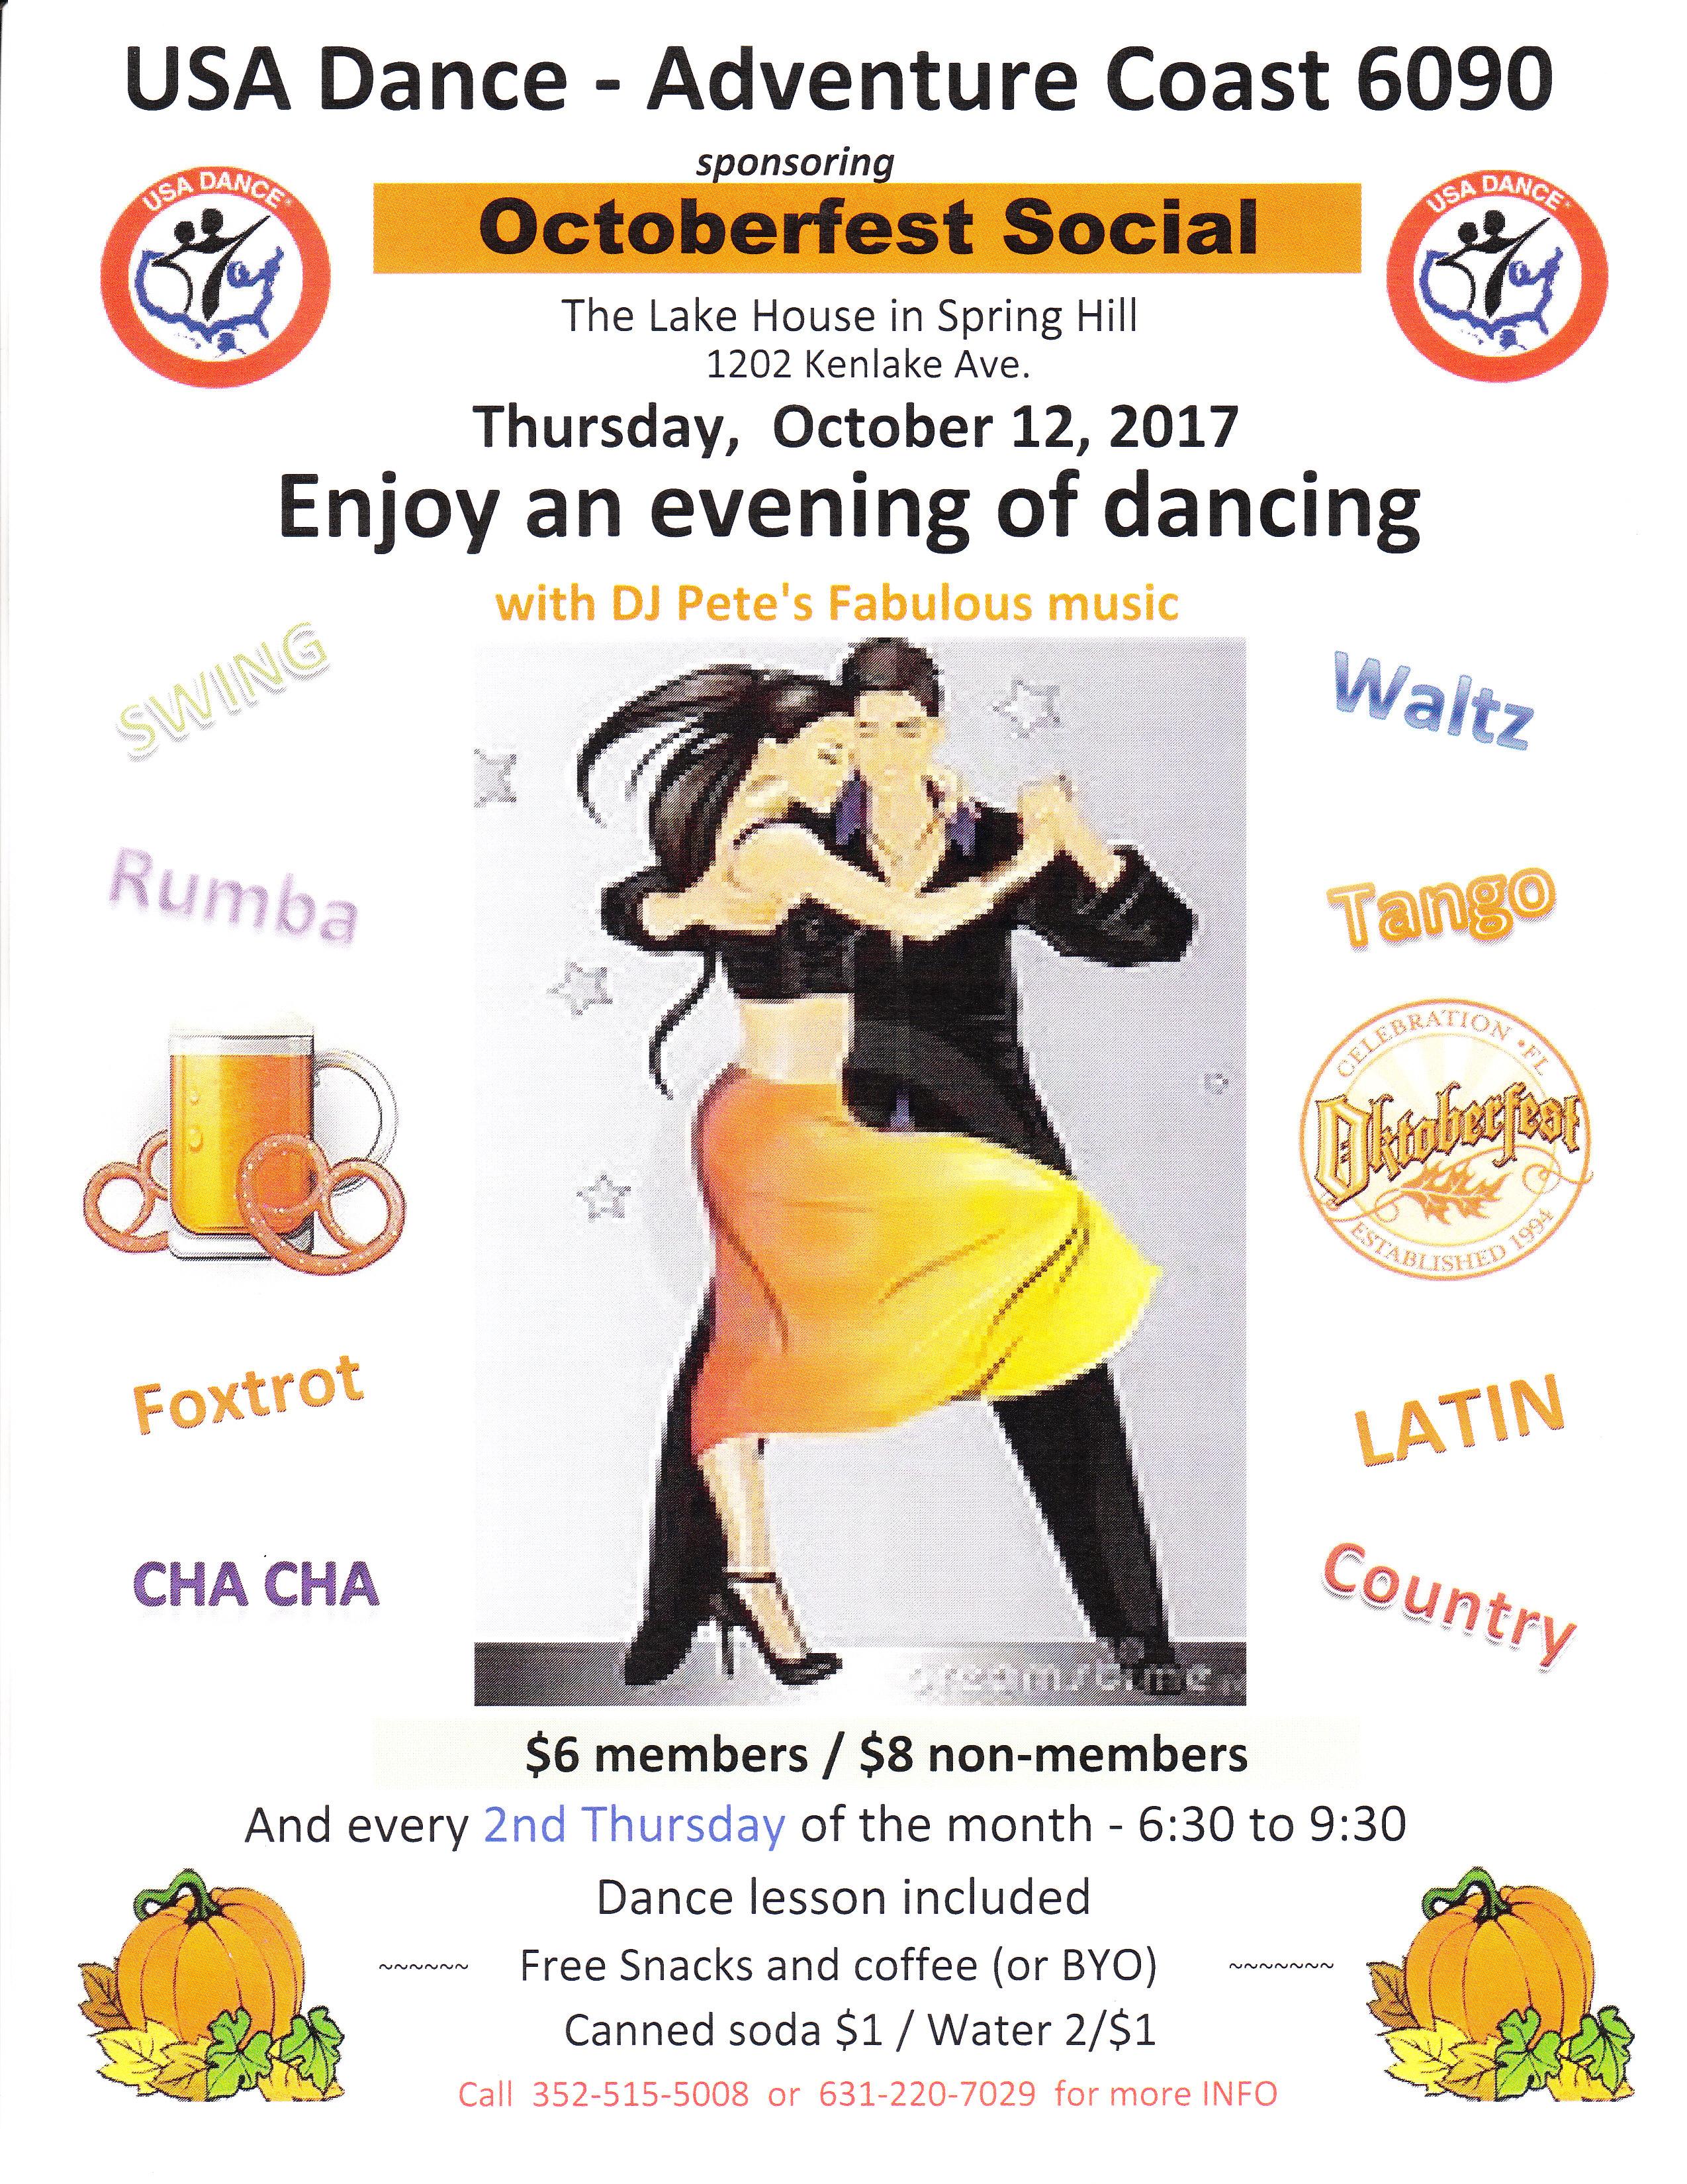 2017 October 12th Octoberfest Dance Social